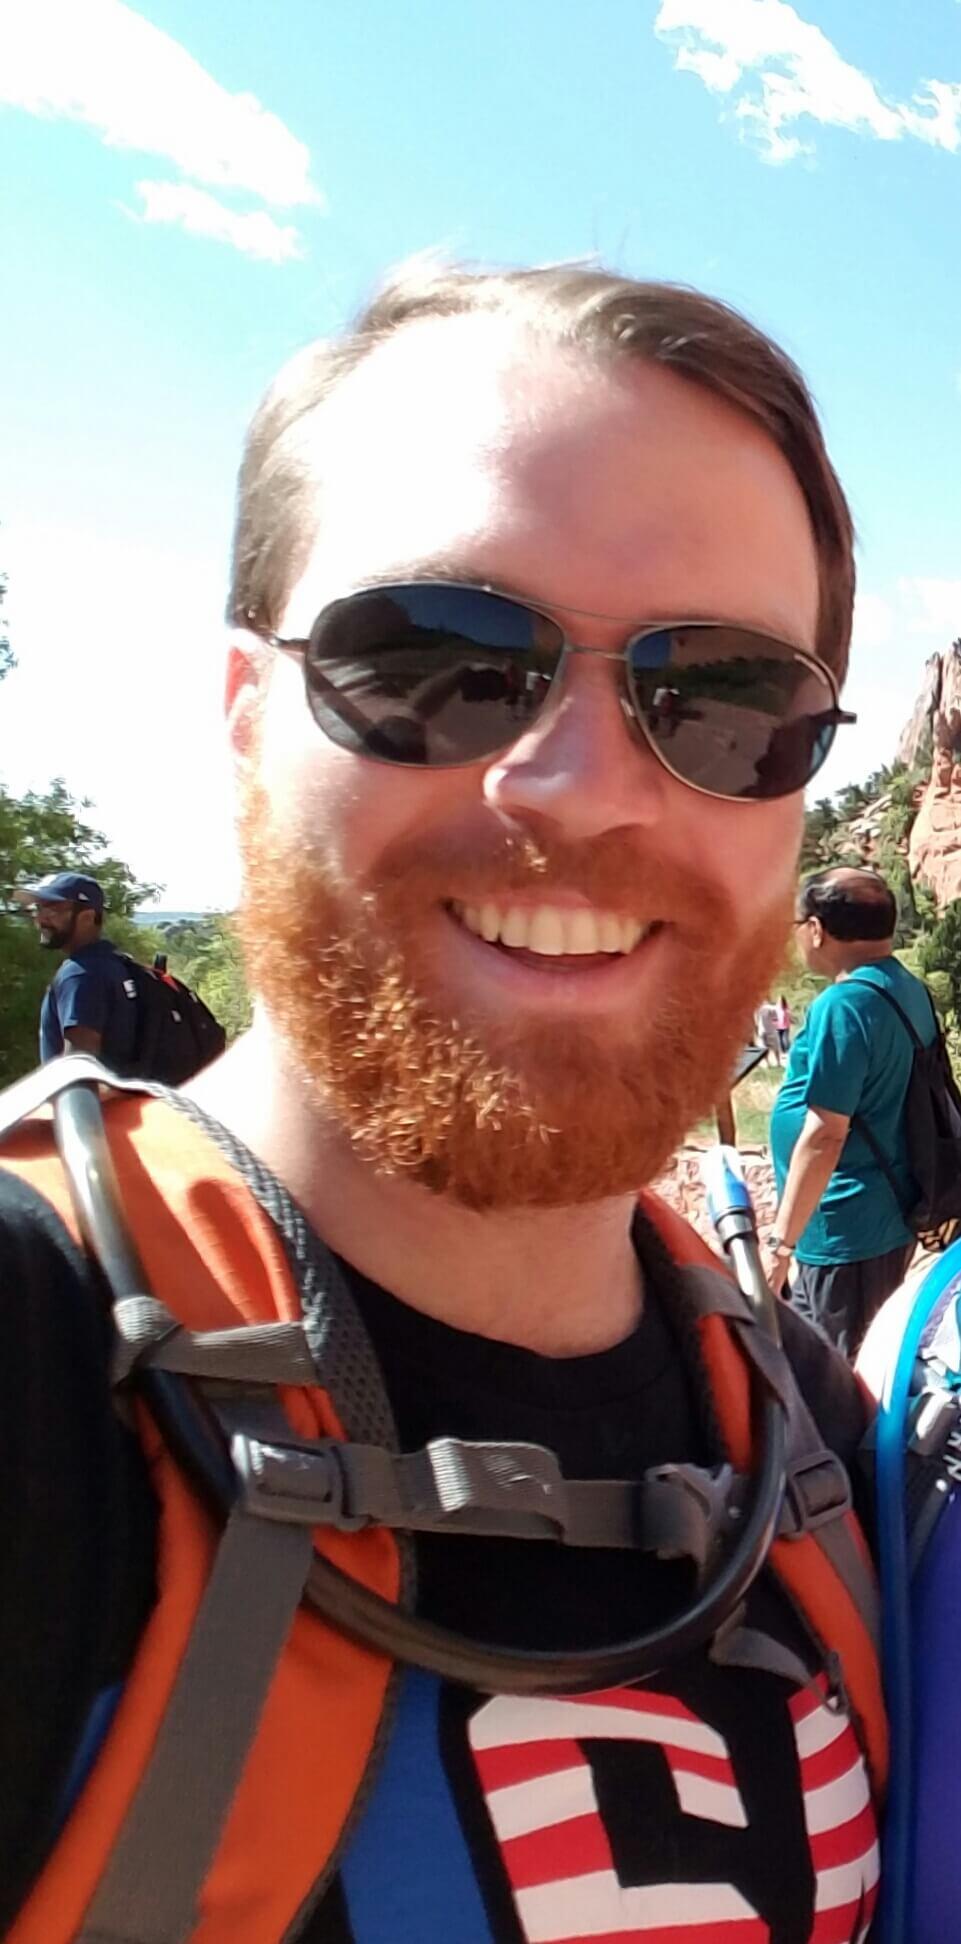 Sunsational Private Swim Lesson Instructor in Denver - Christopher K